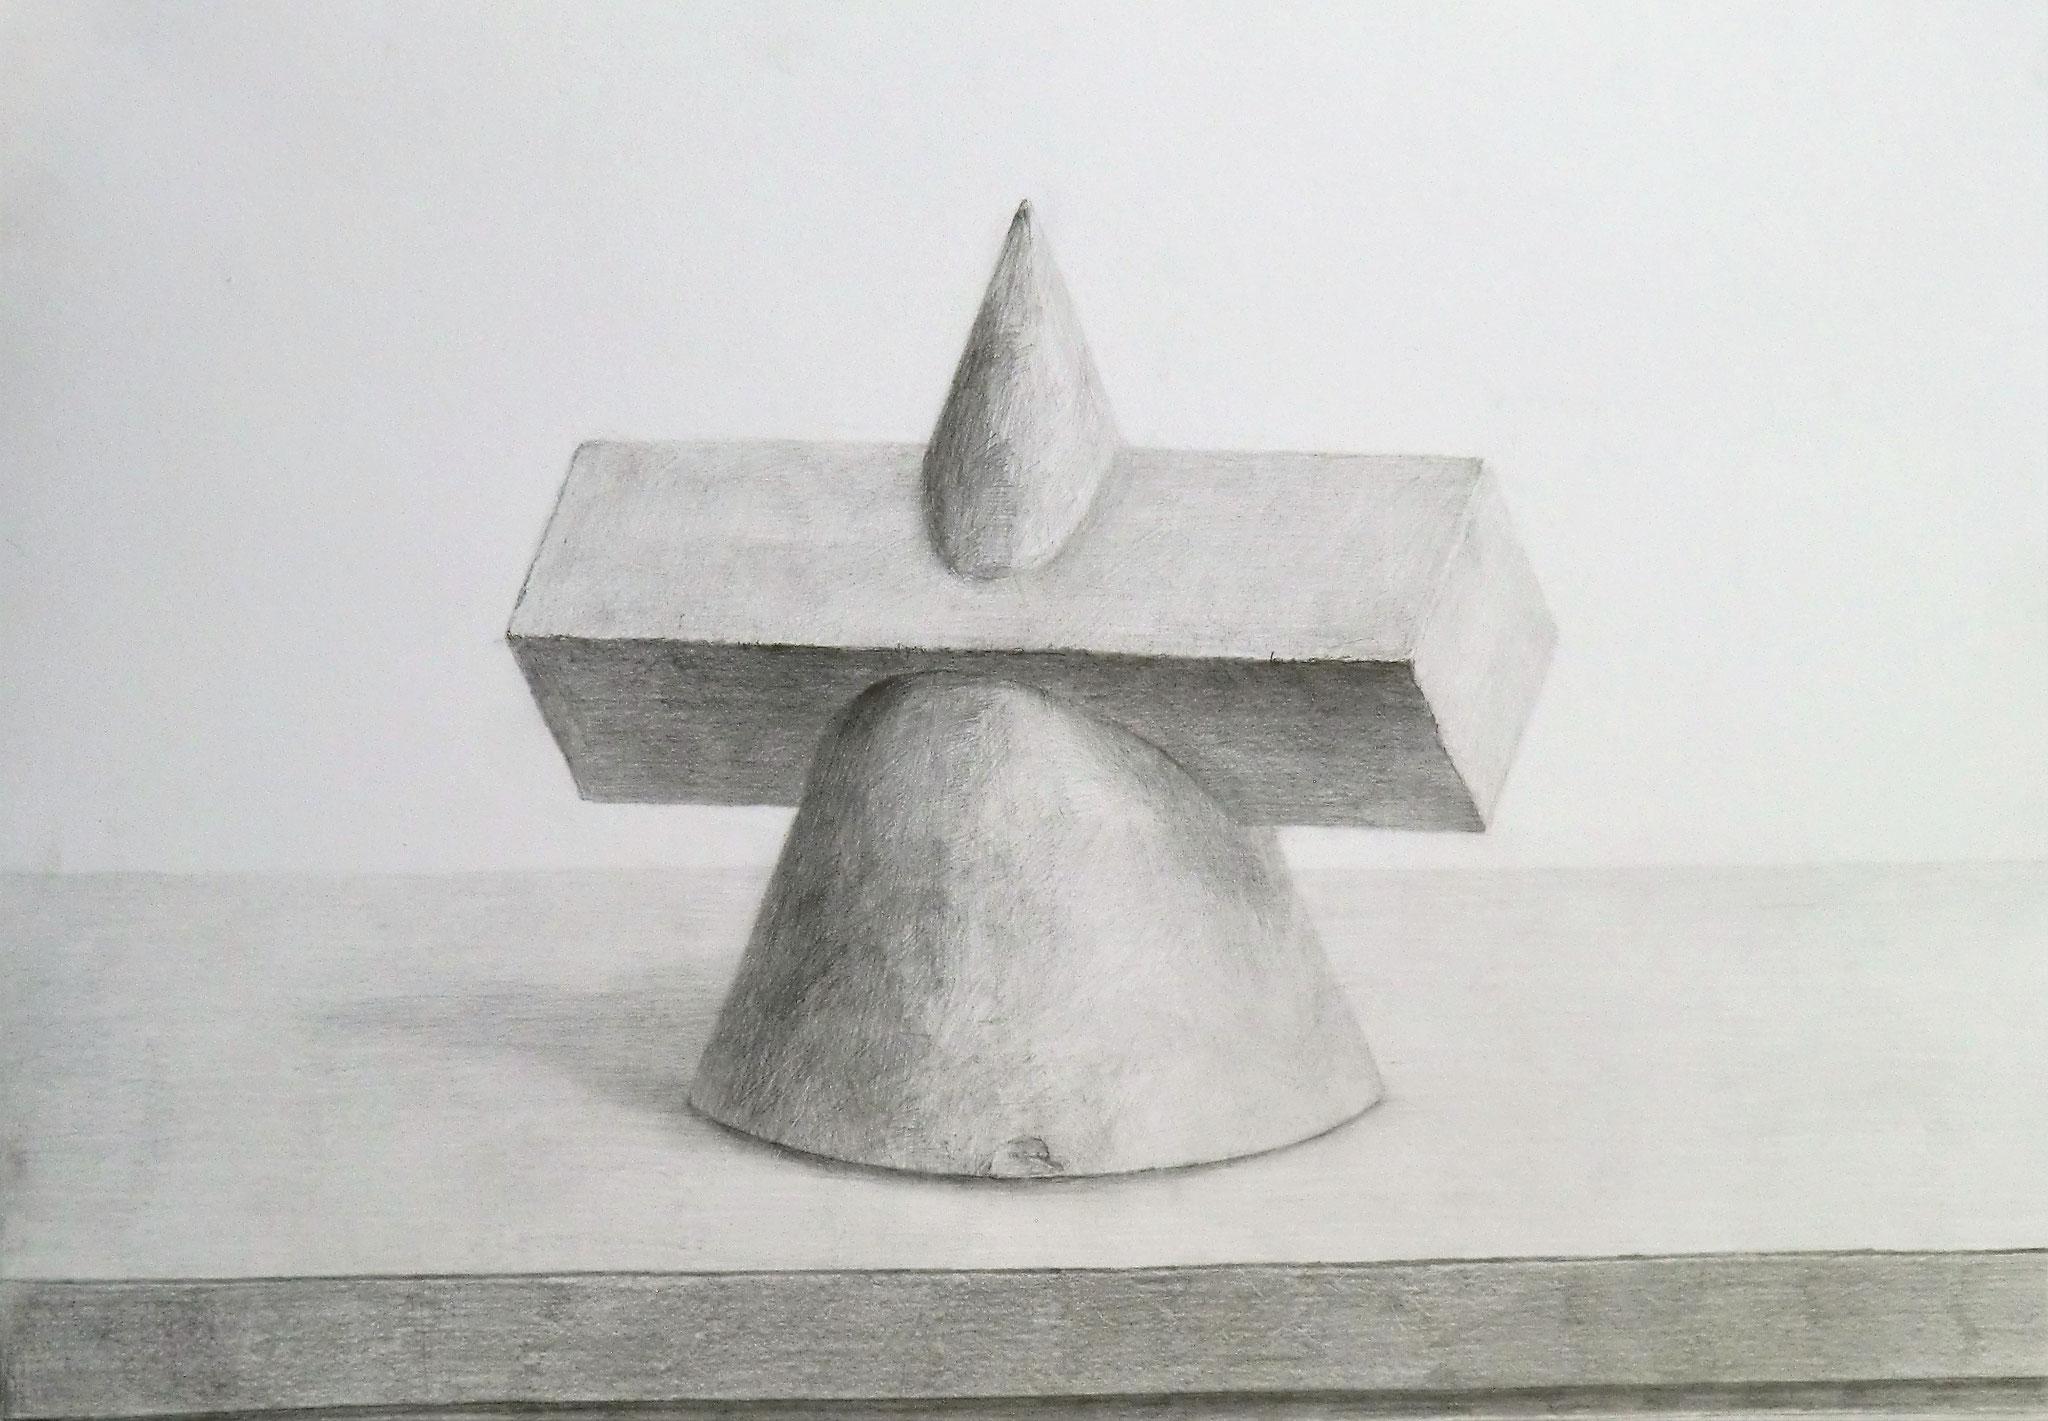 生徒作品70 鉛筆デッサン<相貫体> B3判 白象紙 【日本画系】